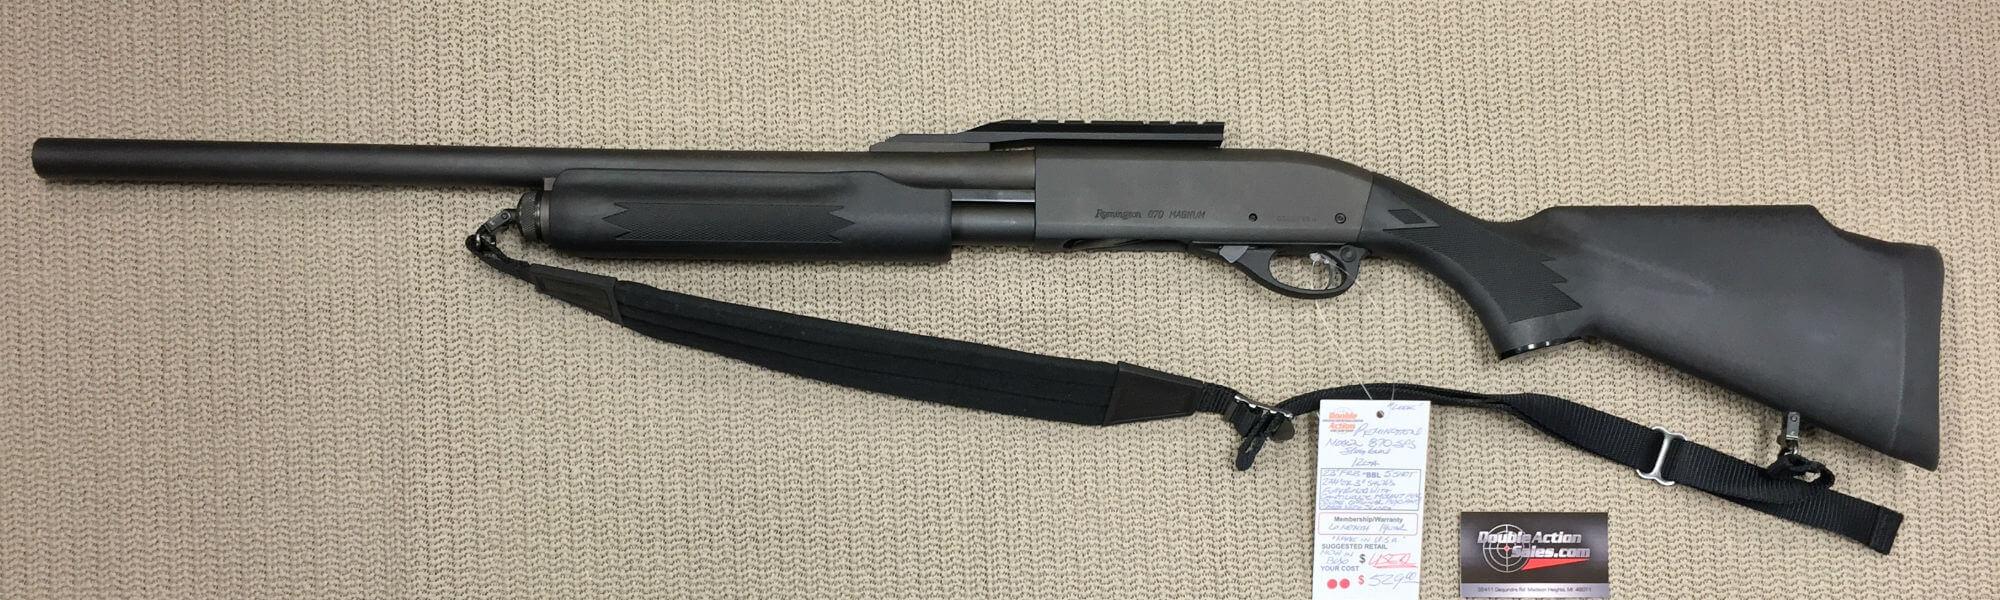 remington used shotguns for sale